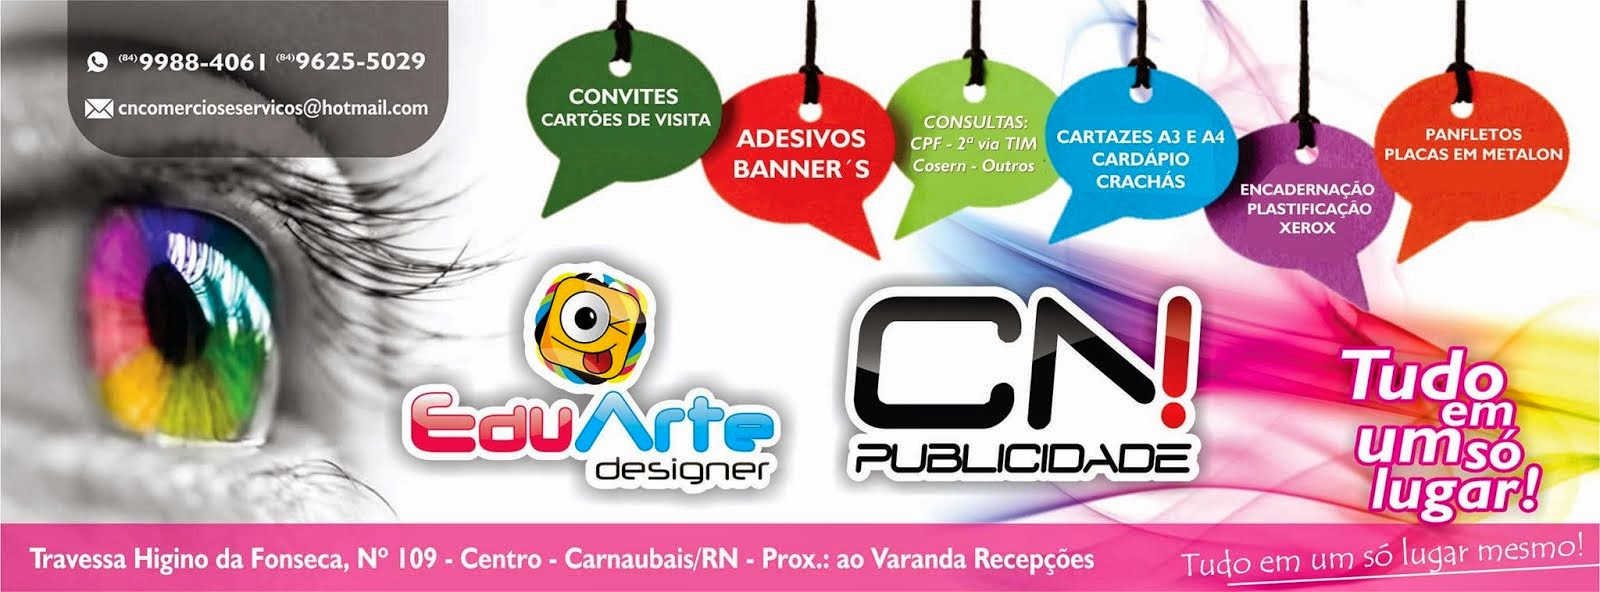 CN PUBLICIDADE